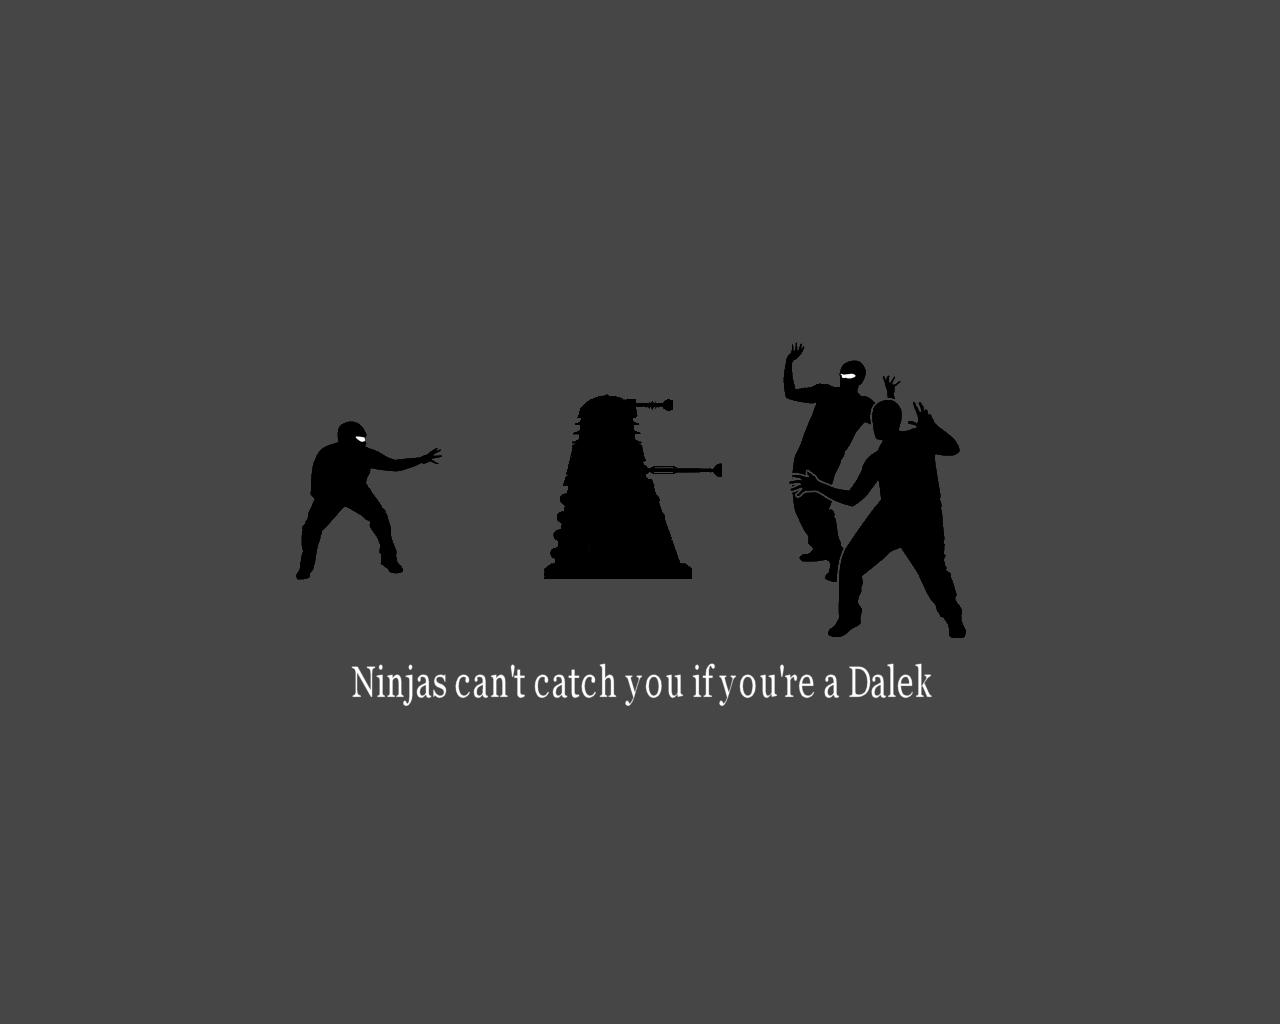 brackgrounds plz. heres mine. Ninjas a Dalek. I have a few favorites